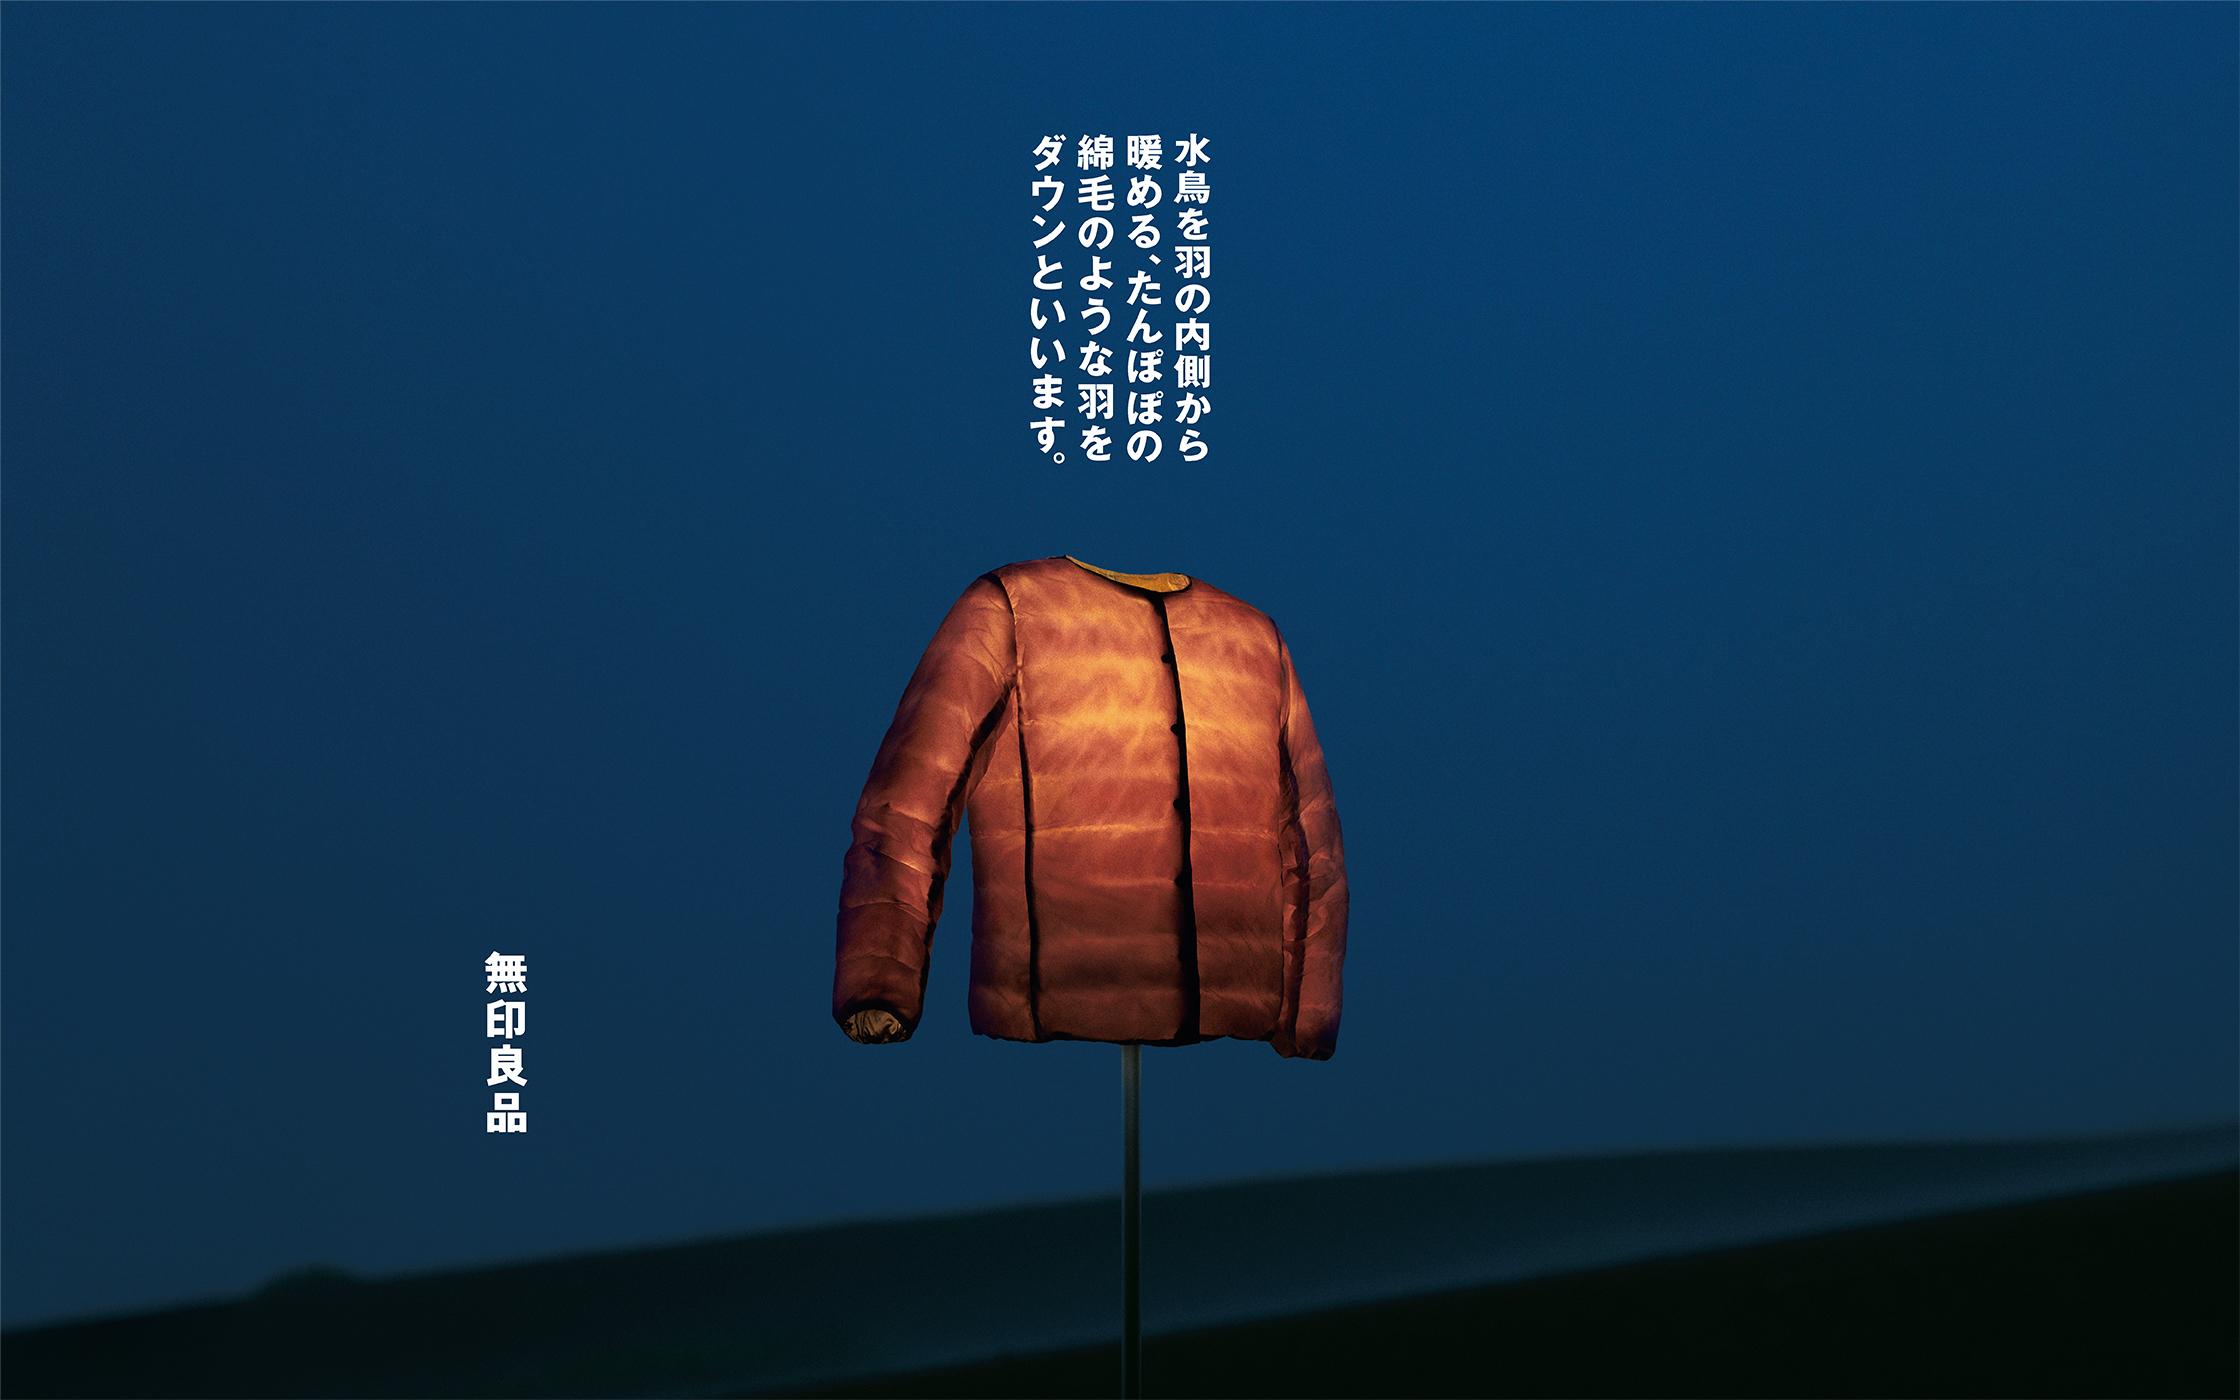 MUJI Down Jacket Promotion